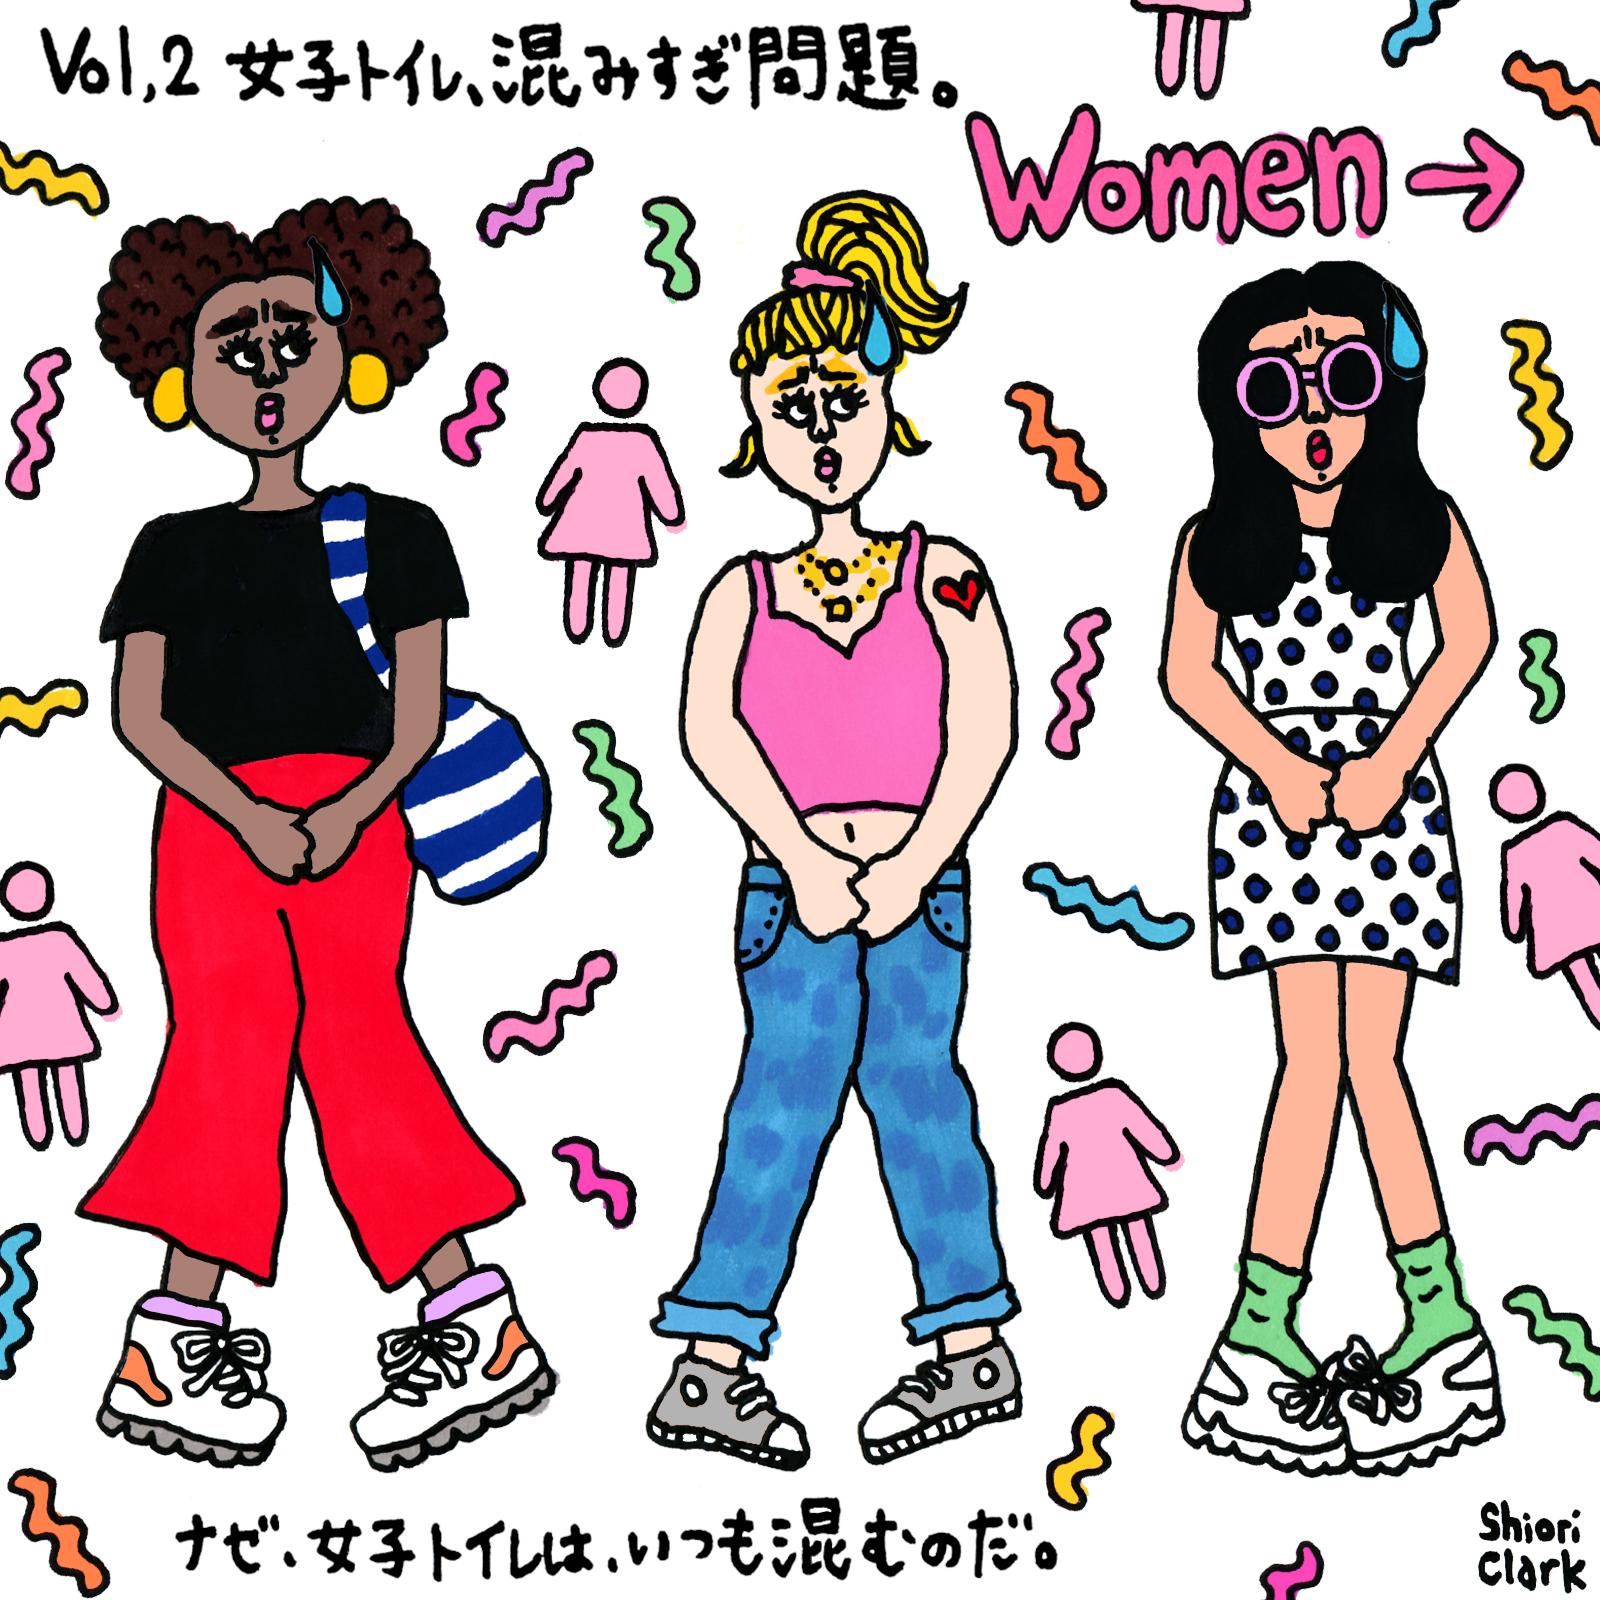 Vol.2 女子トイレ混みすぎ問題【クラーク志織のハロー!フェミニズム】